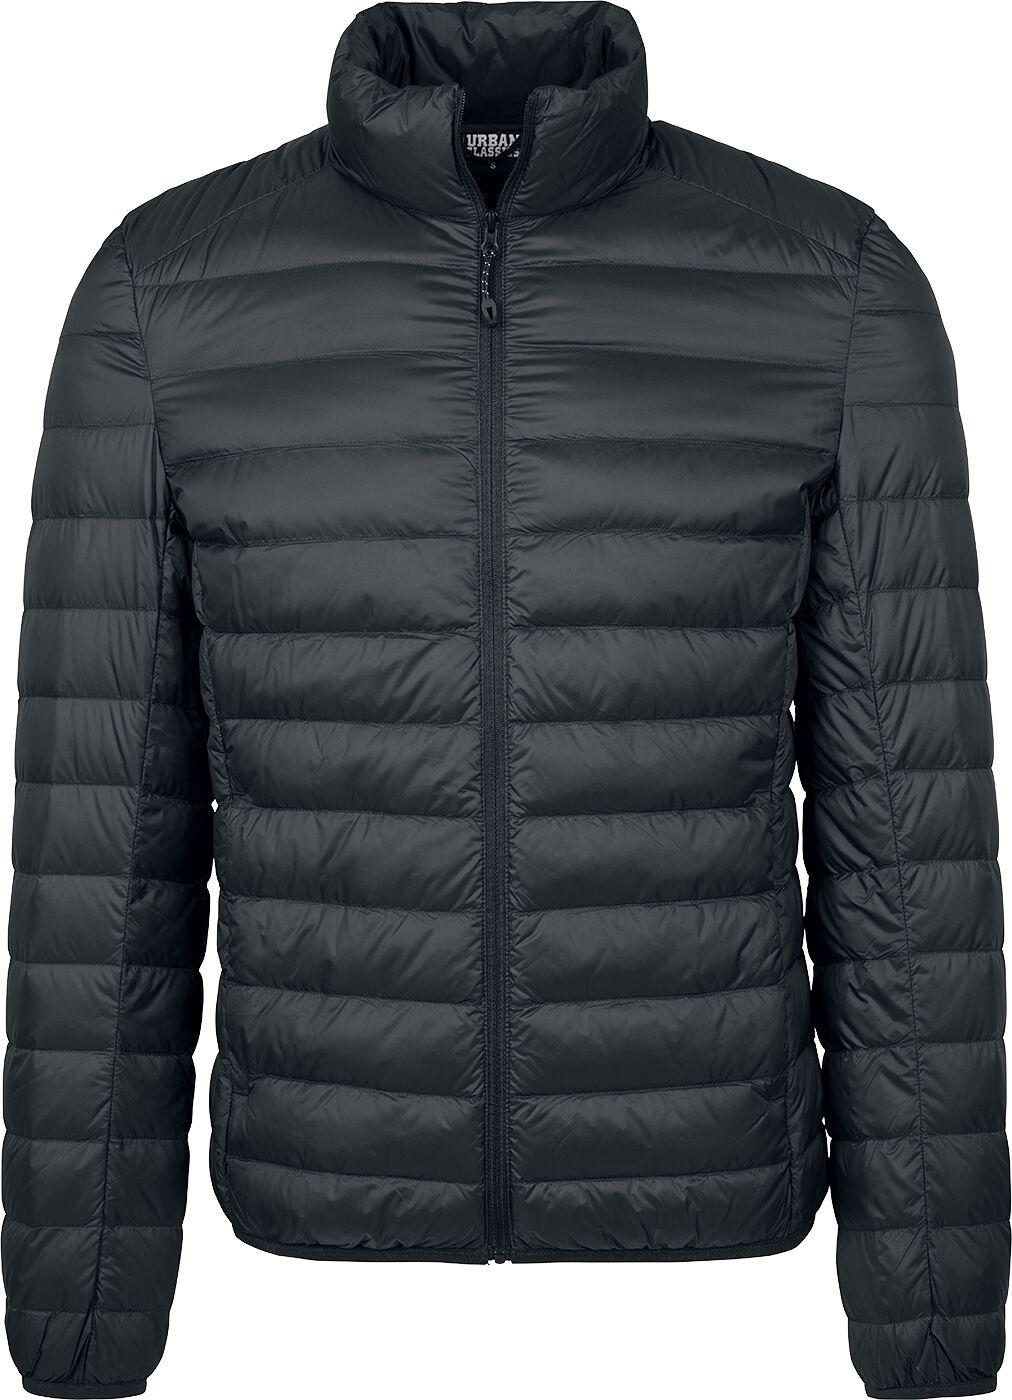 Image of   Urban Classics Basic Down Jacket Jakke sort